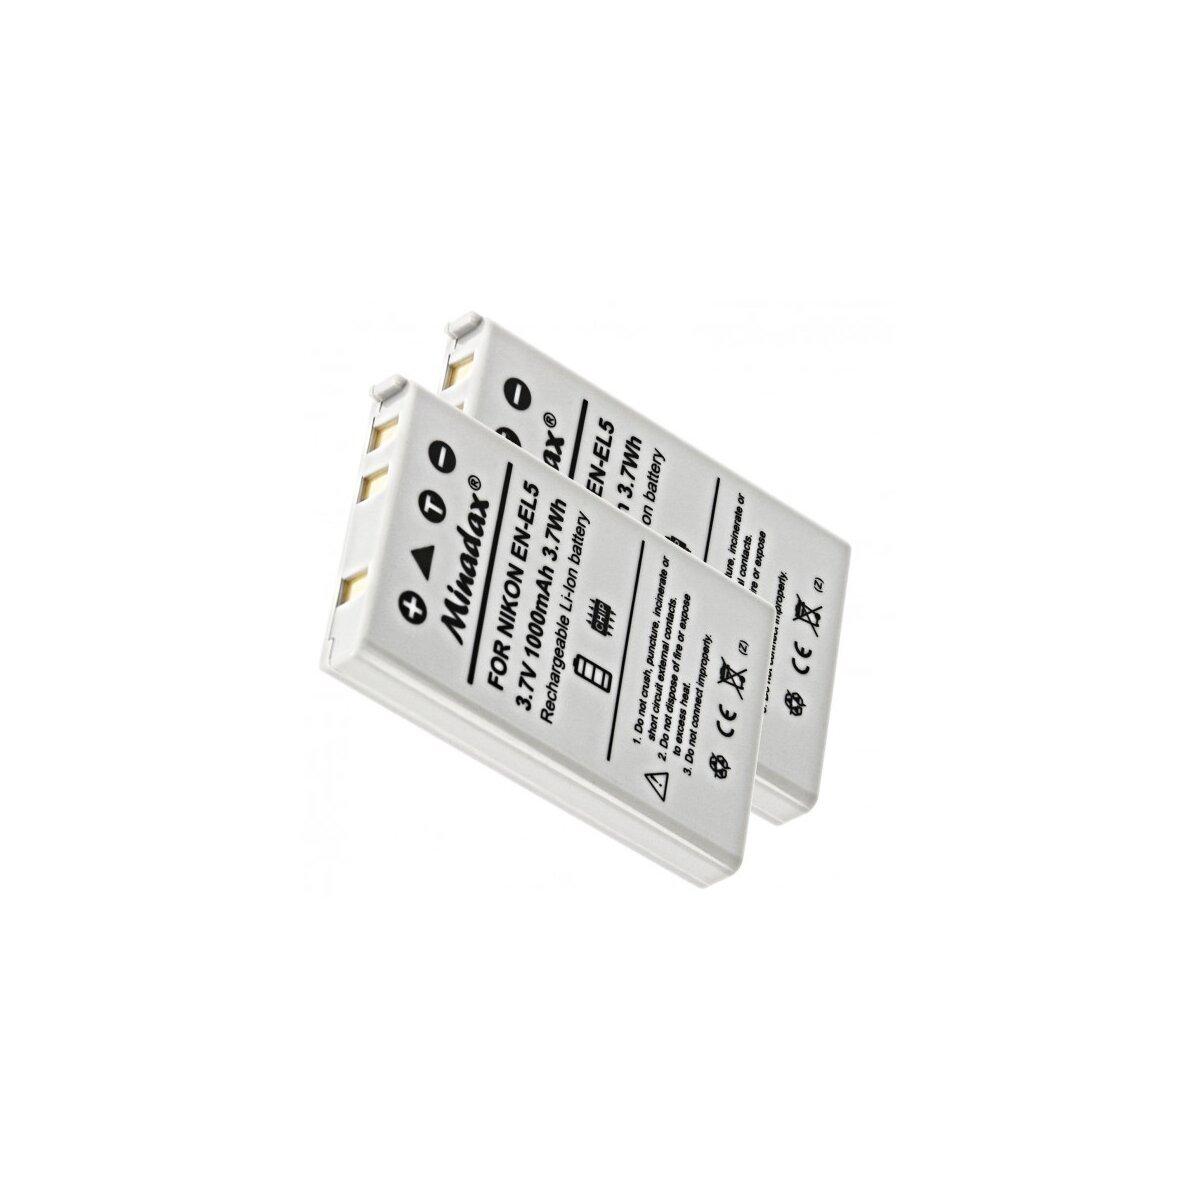 Minadax® 2x Qualitätsakku mit echten 1000 mAh kompatibel mit Nikon C3700 4200 5200 5900 7900 P3 P4 S10 P5000 P510 P520, Ersatz für EN-EL5 - Intelligentes Akkusystem mit Chip